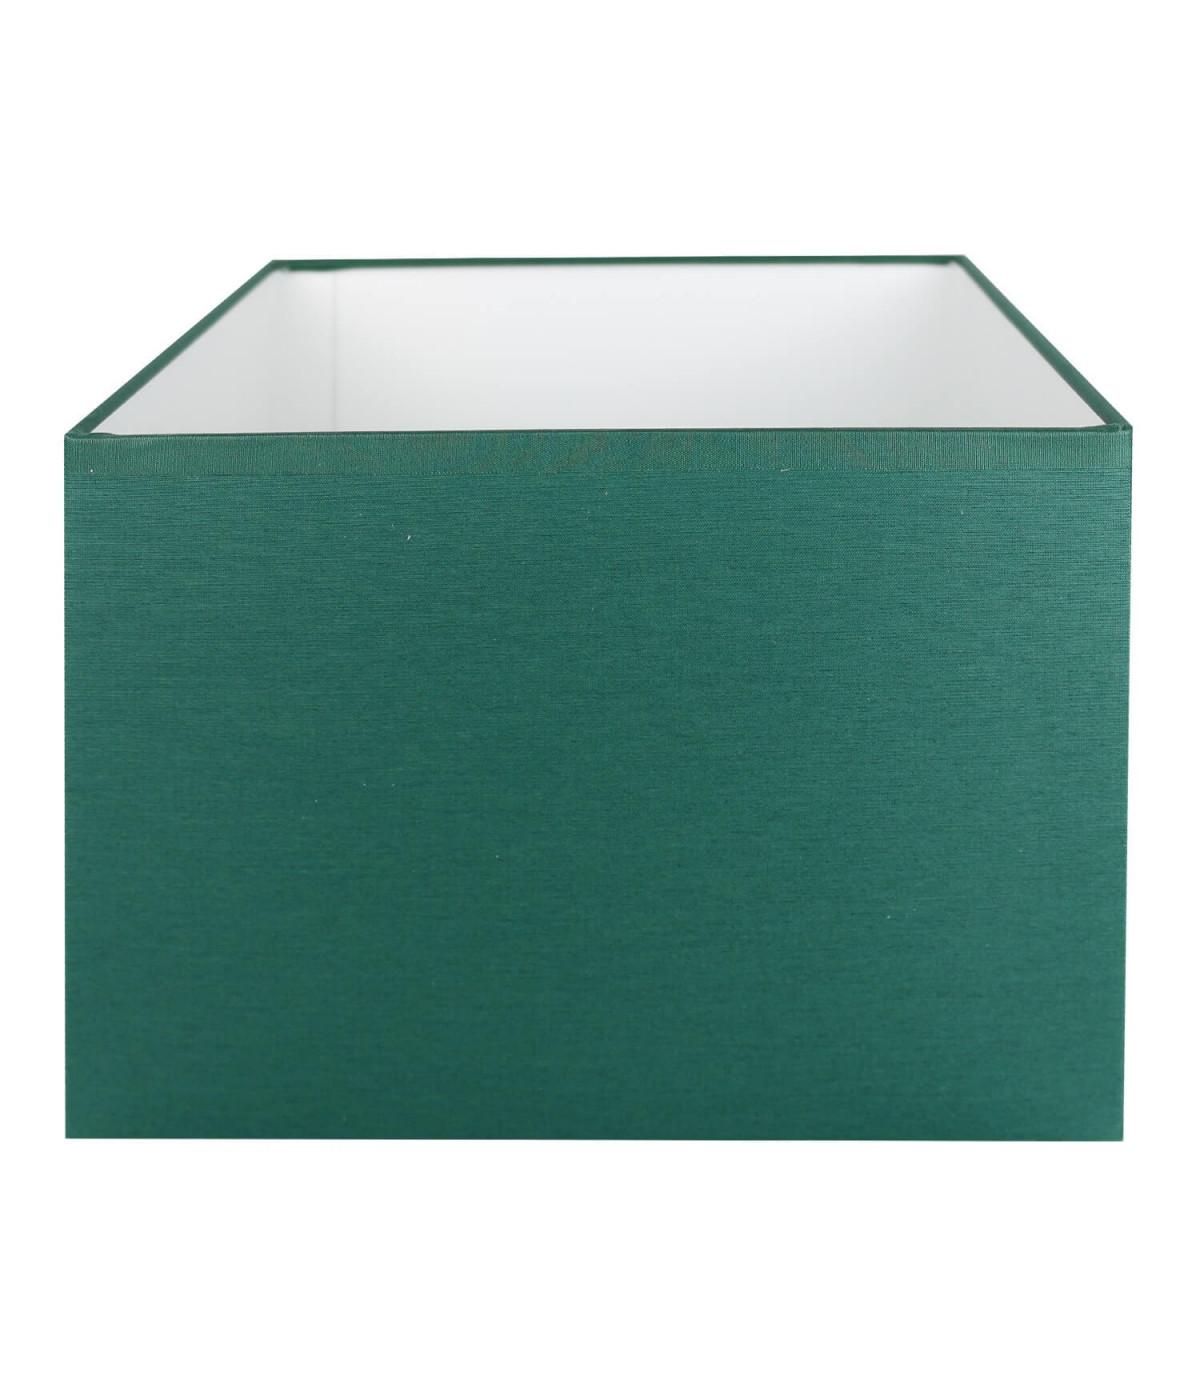 Abat-jour rectangle Vert empire